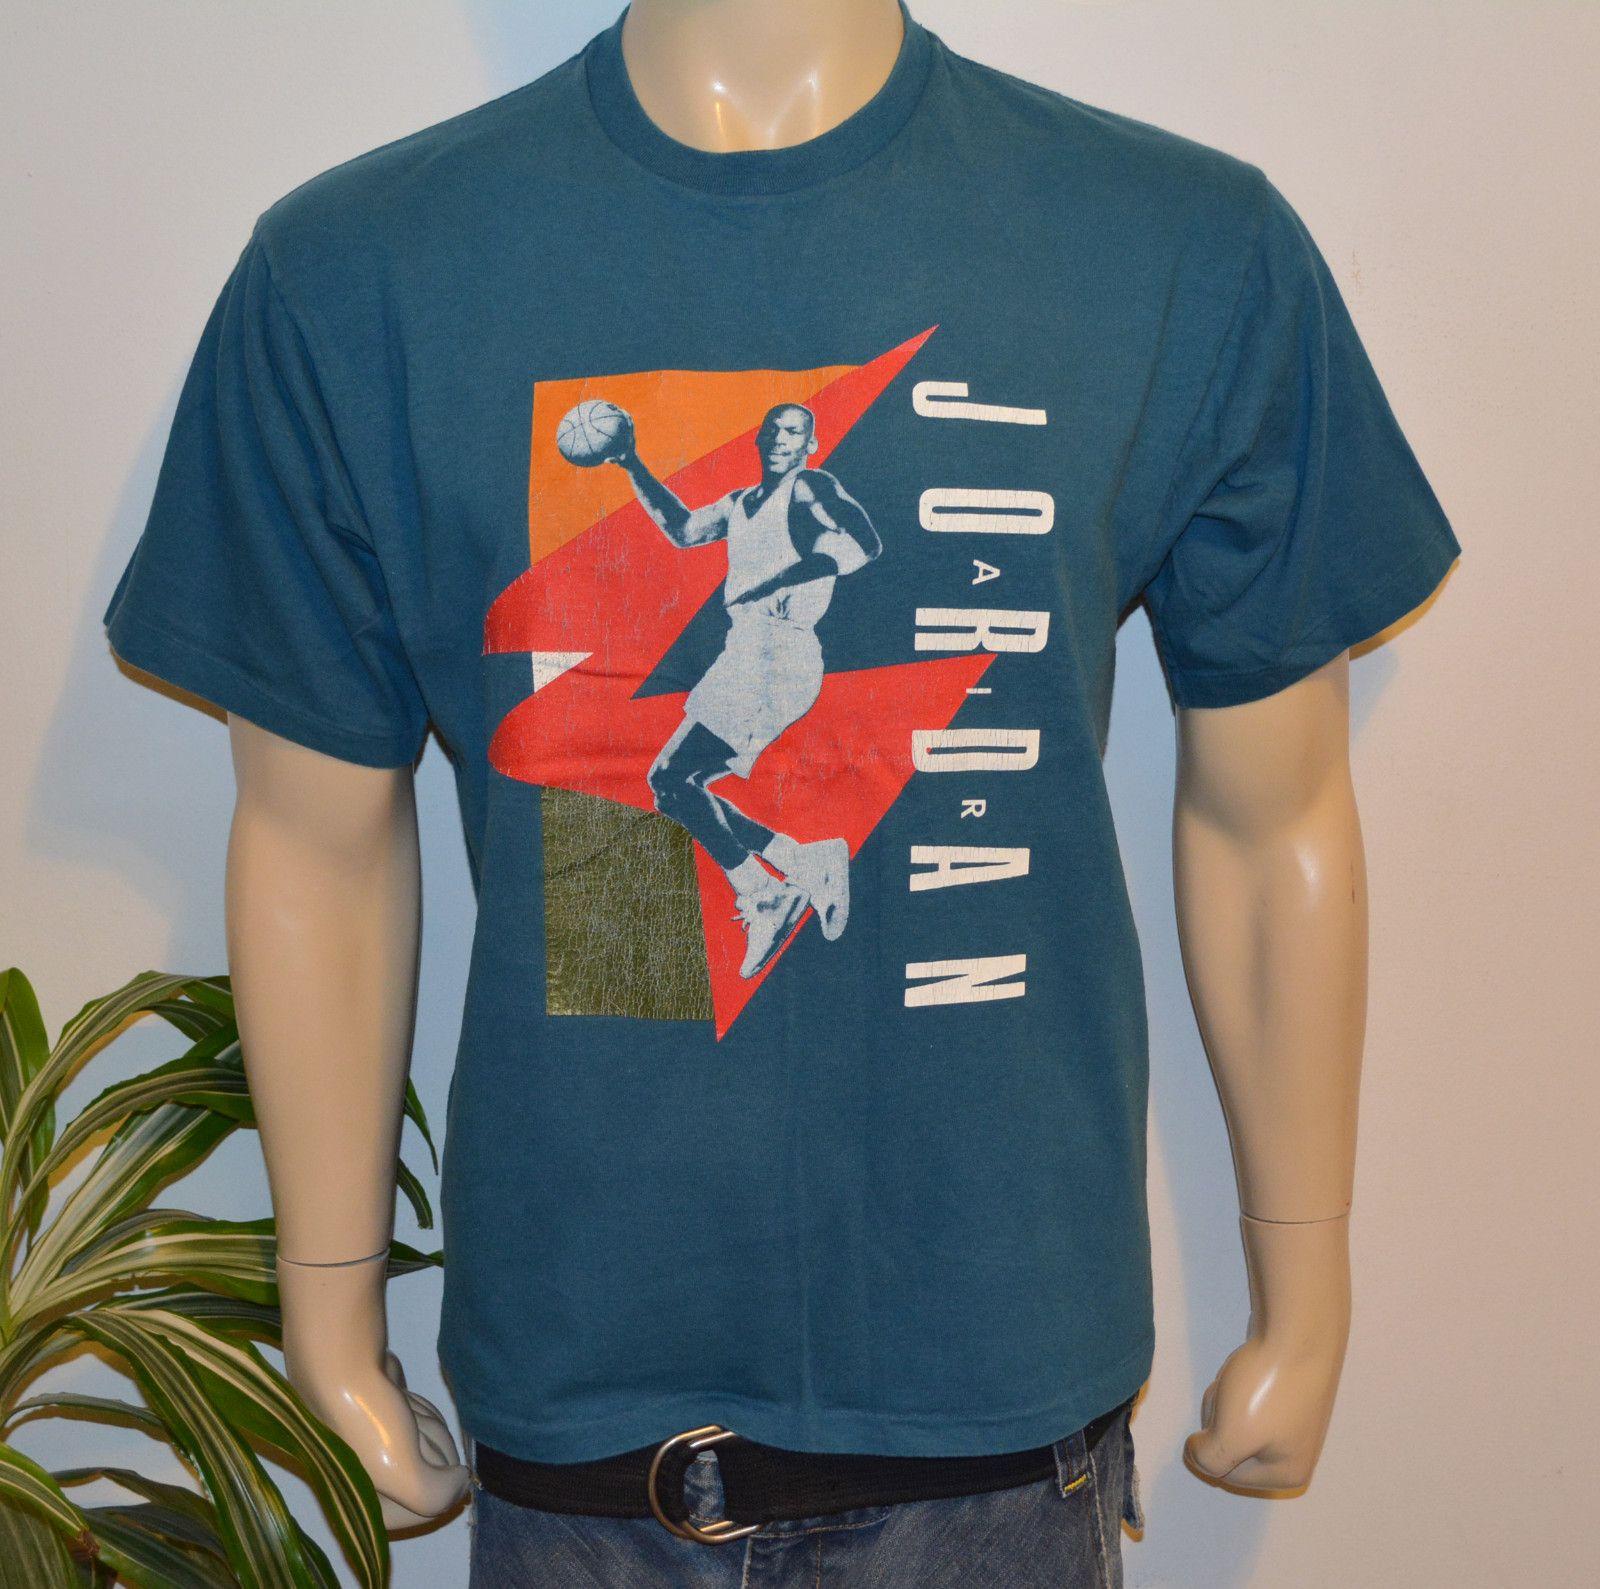 RaRe *80s 90s NIKE AIR / MICHAEL JORDAN* vintage chicago bulls t-shirt (M/L) NBA